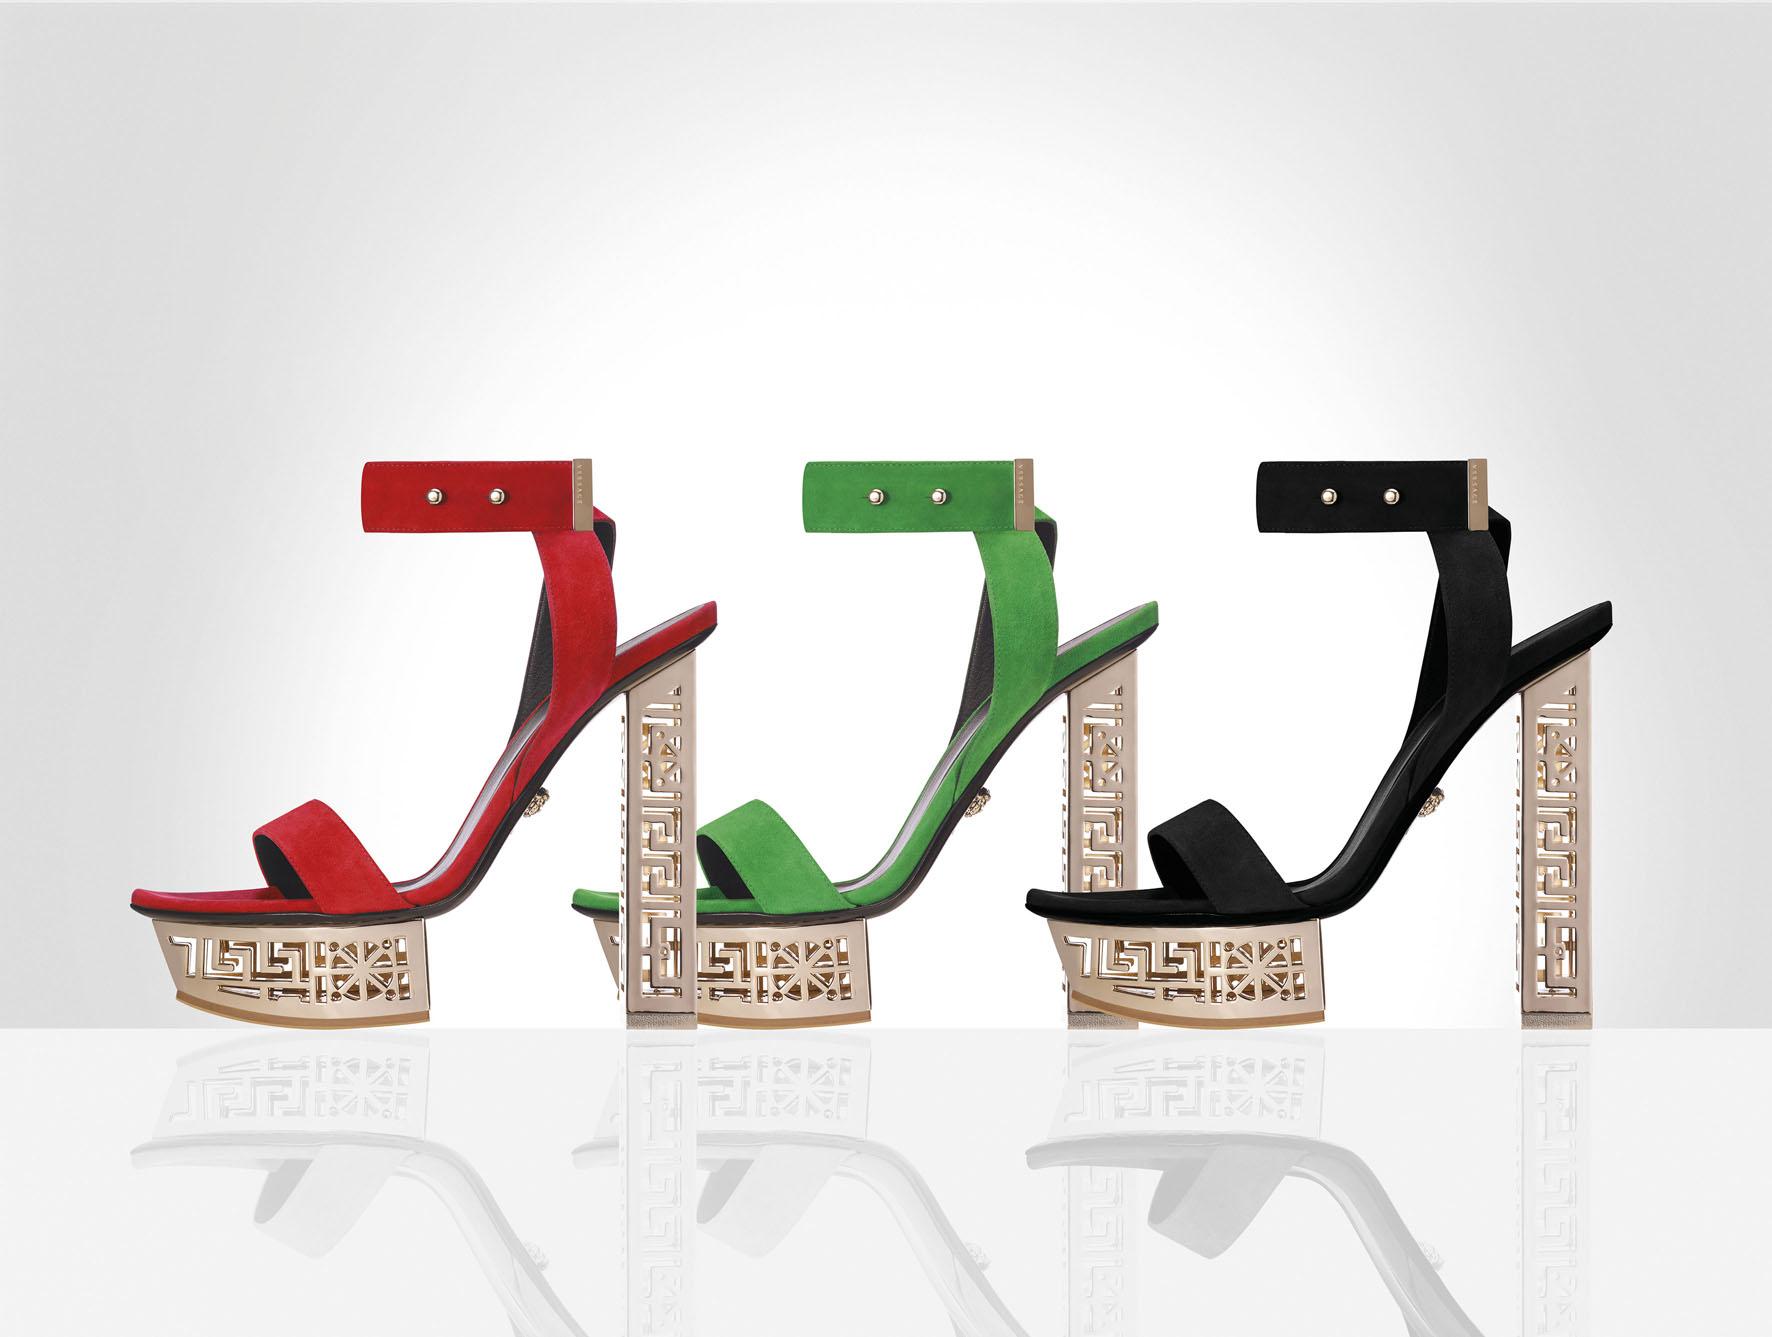 #GREEK 麂皮高跟鞋 每款 TWD51,500